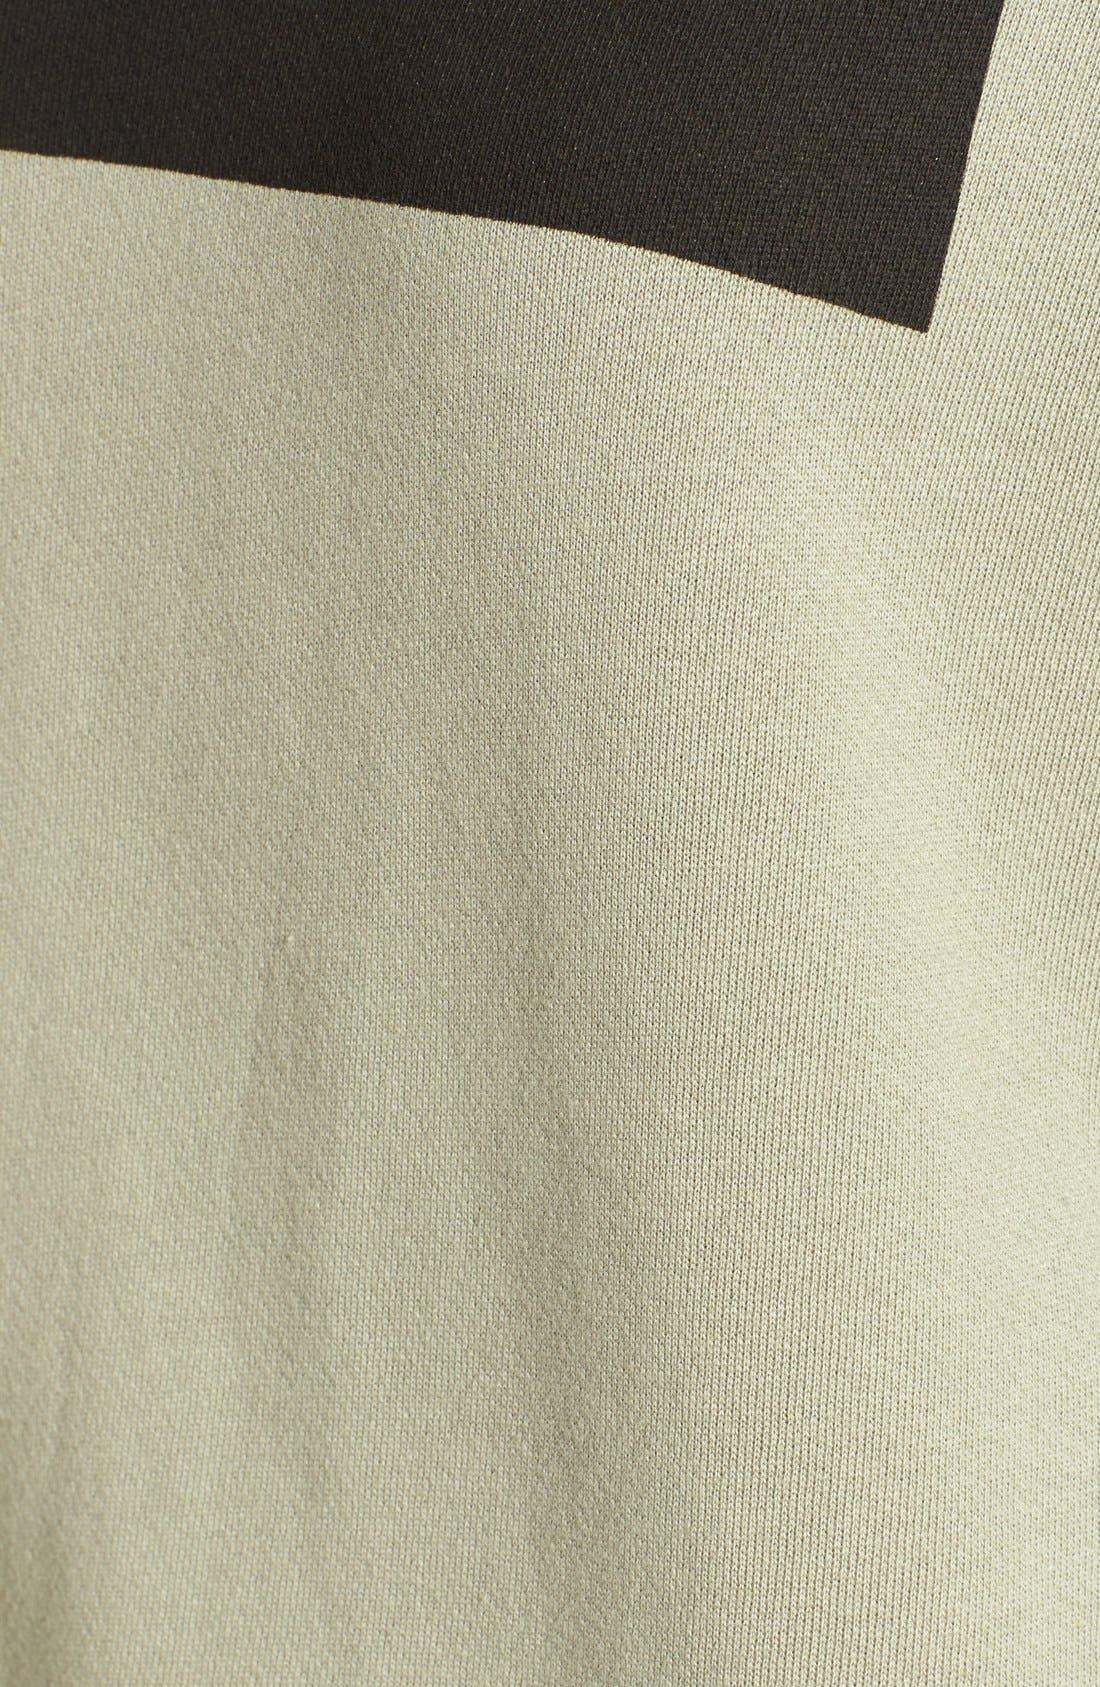 Army of Lovers Side Zip Sweatshirt,                             Alternate thumbnail 7, color,                             301